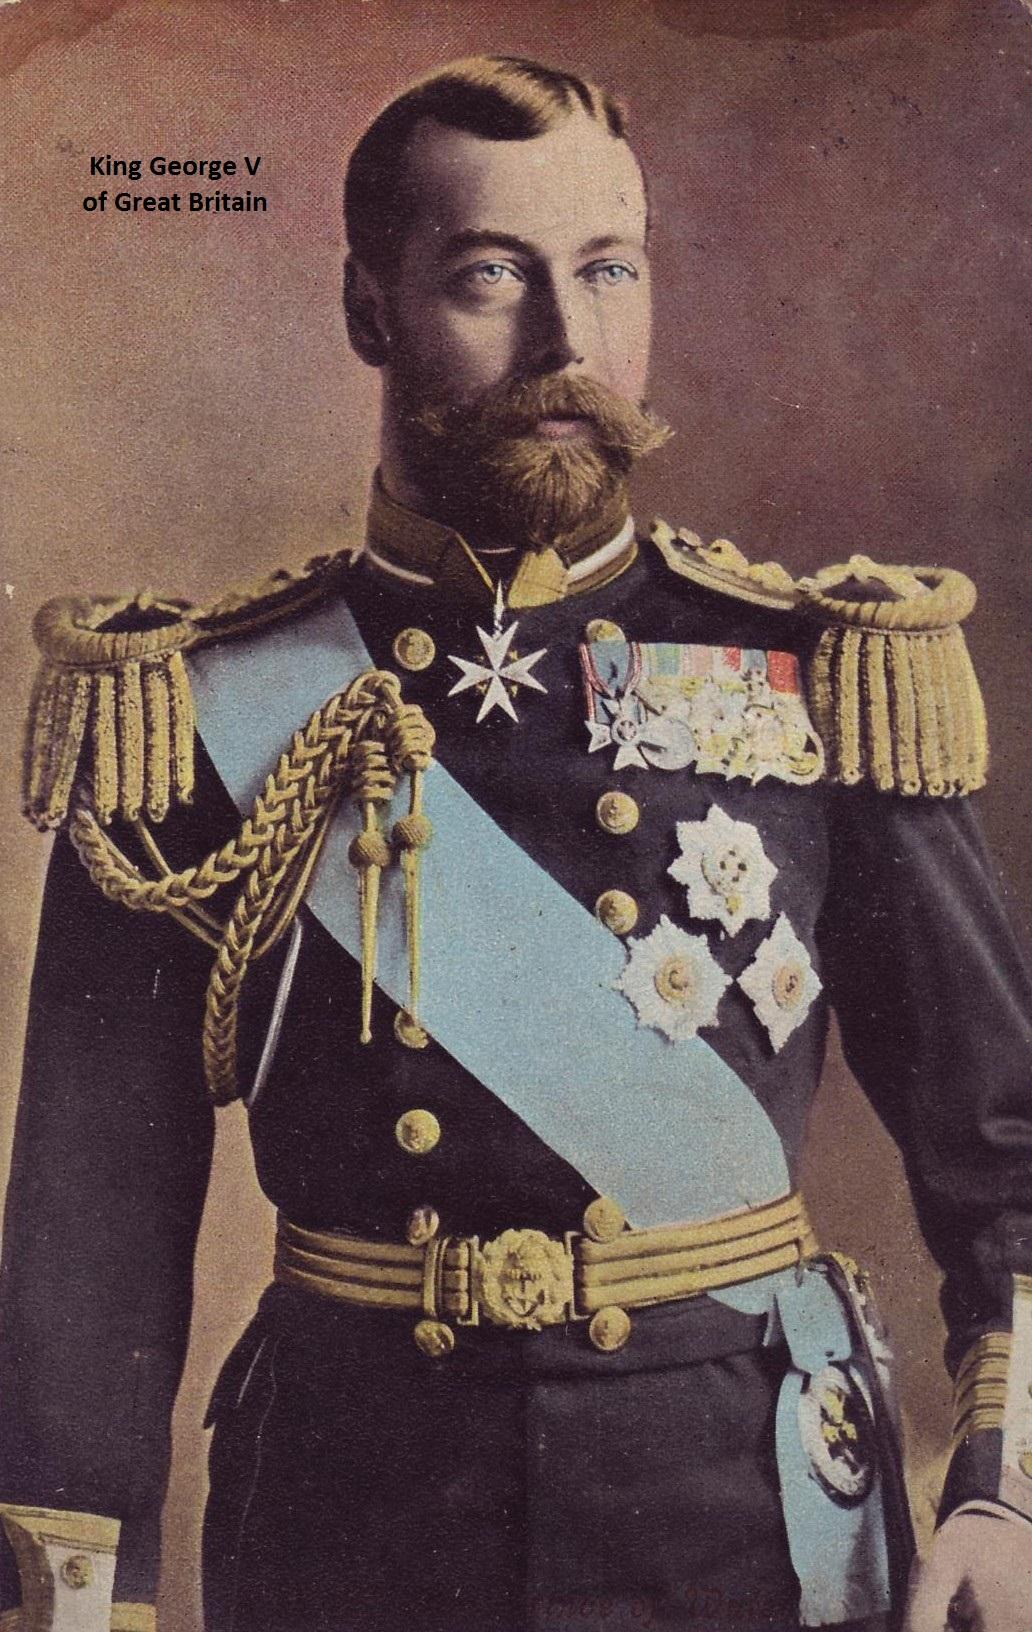 Csar look-a-like, King George V